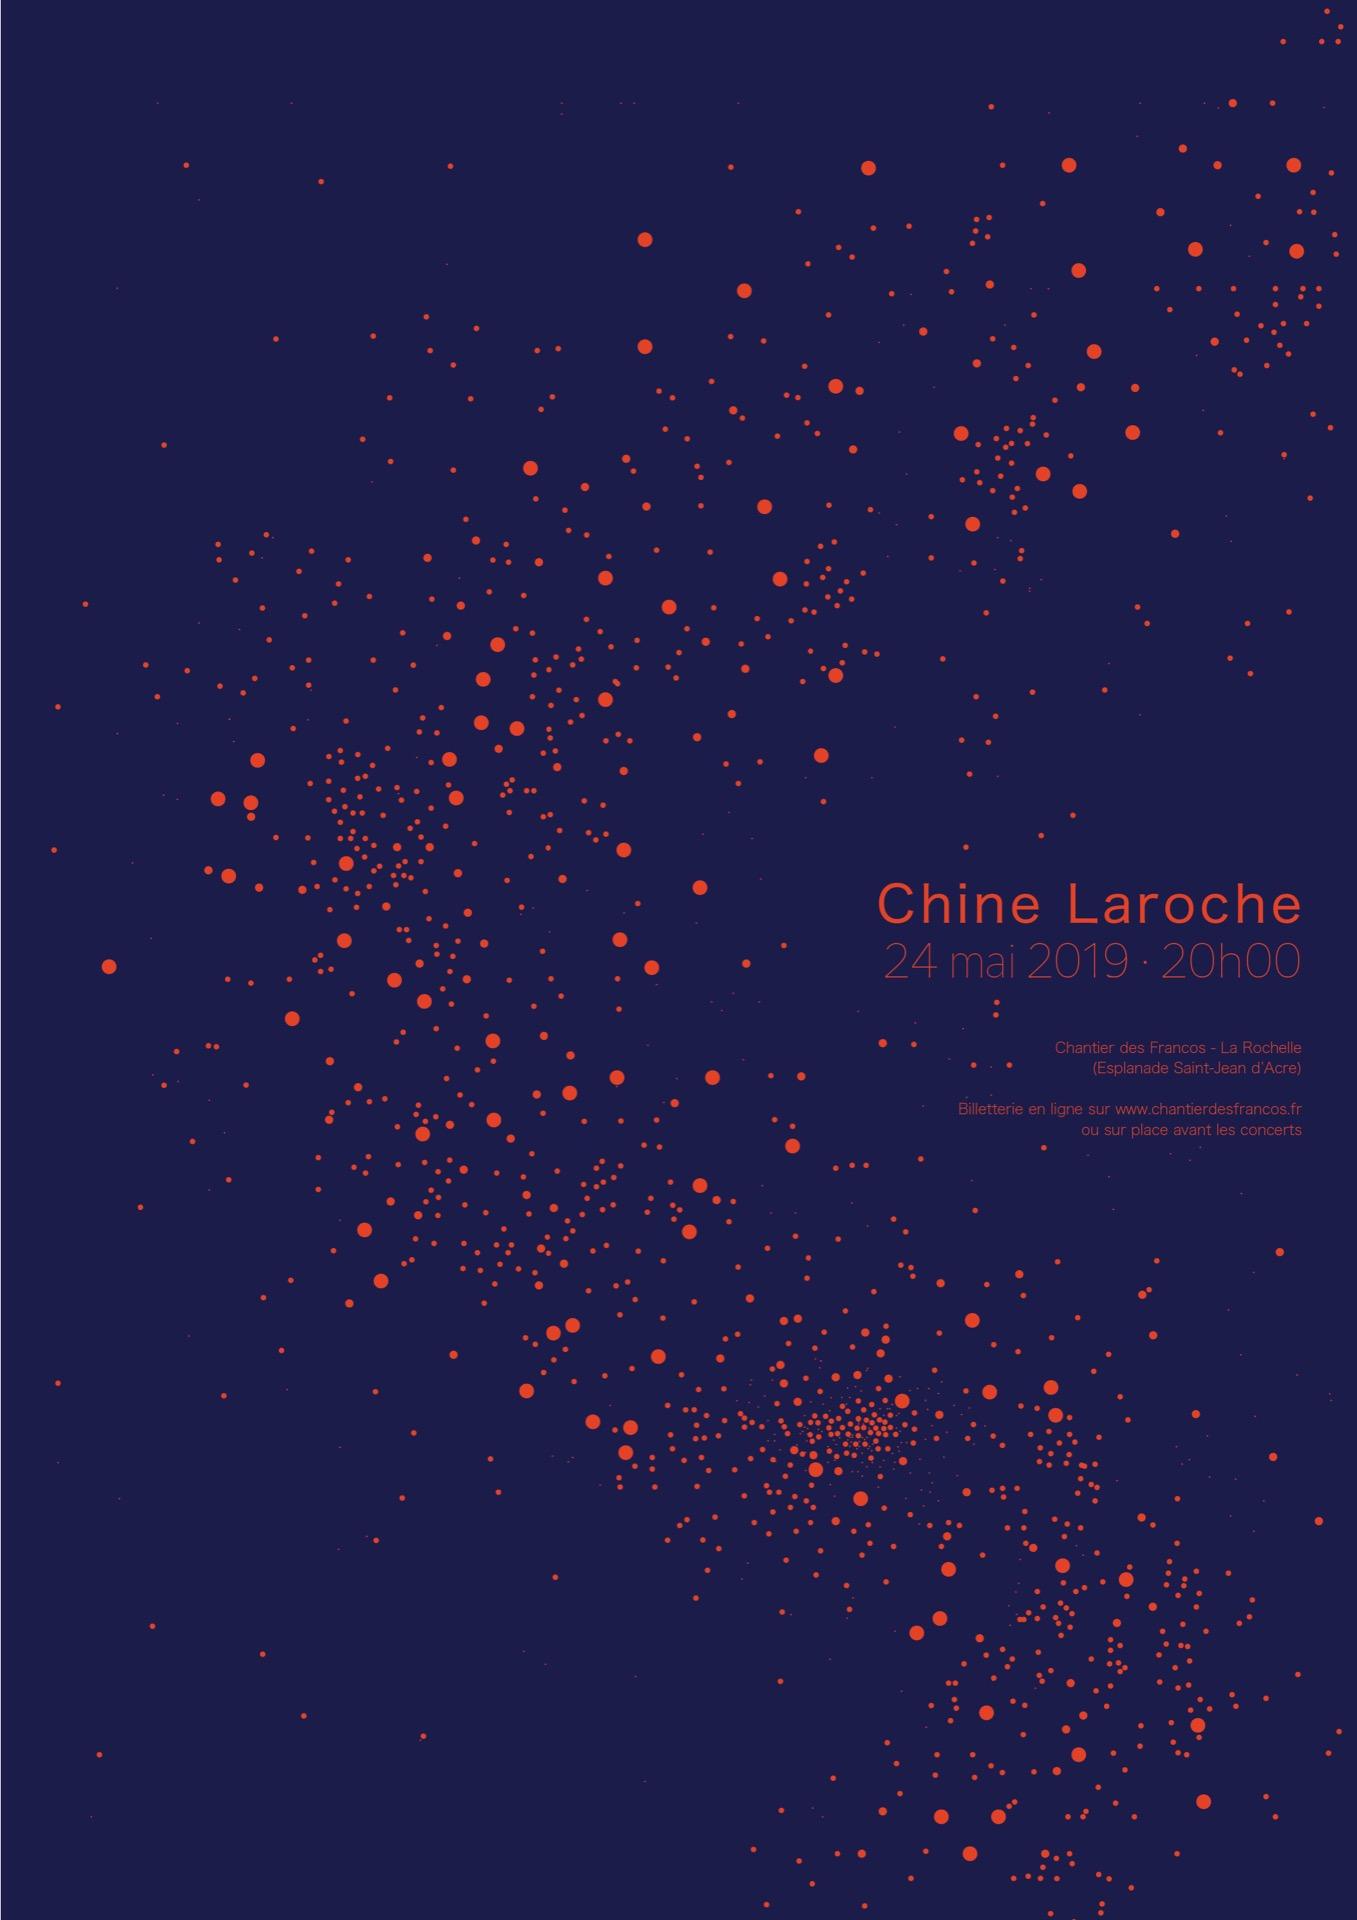 Chine Laroche par Marie Bally